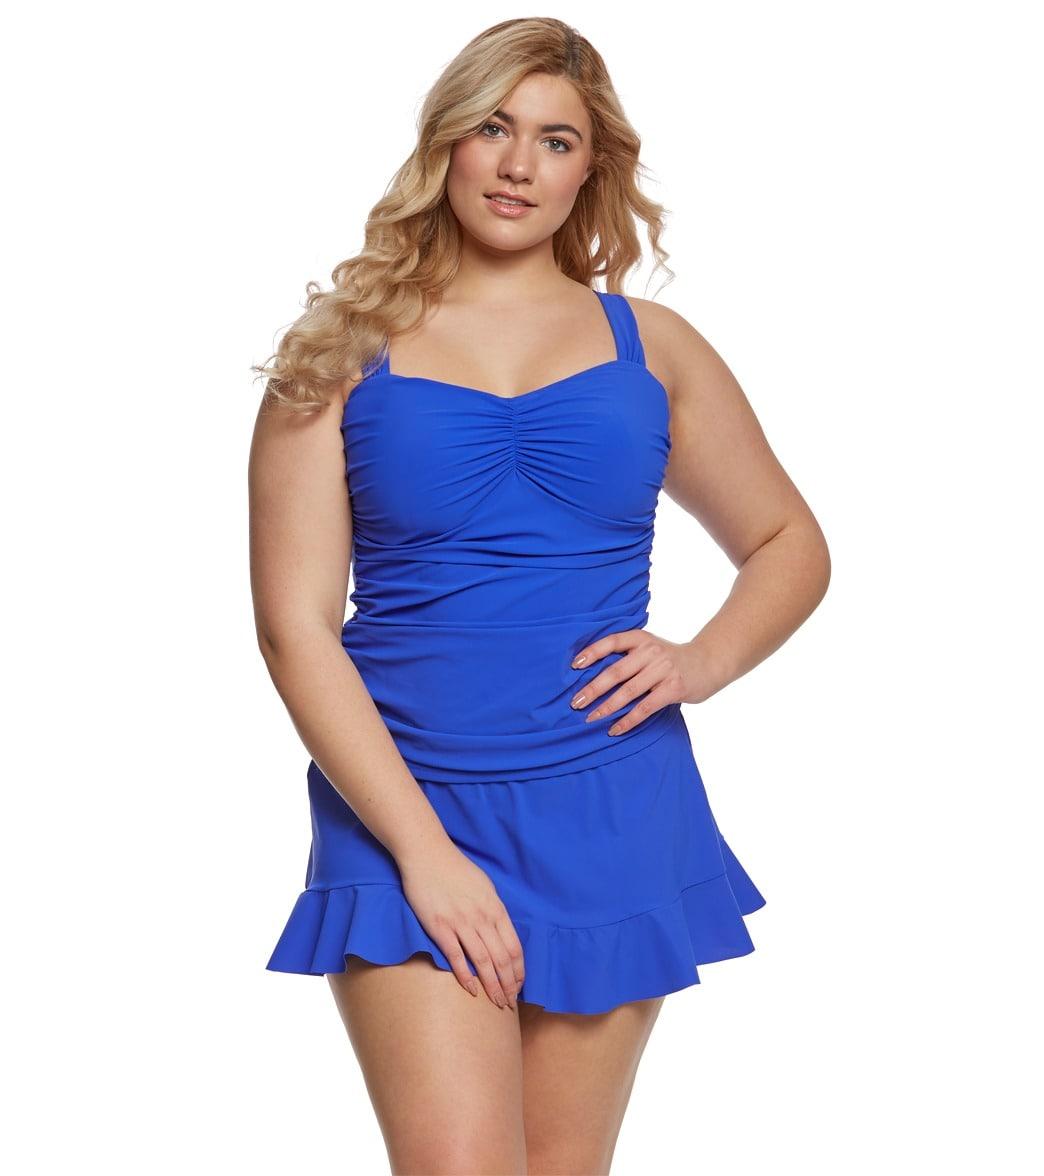 9836dbaf22990 Profile by Gottex Plus Size Tutti Frutti Underwire Sweetheart Tankini Top